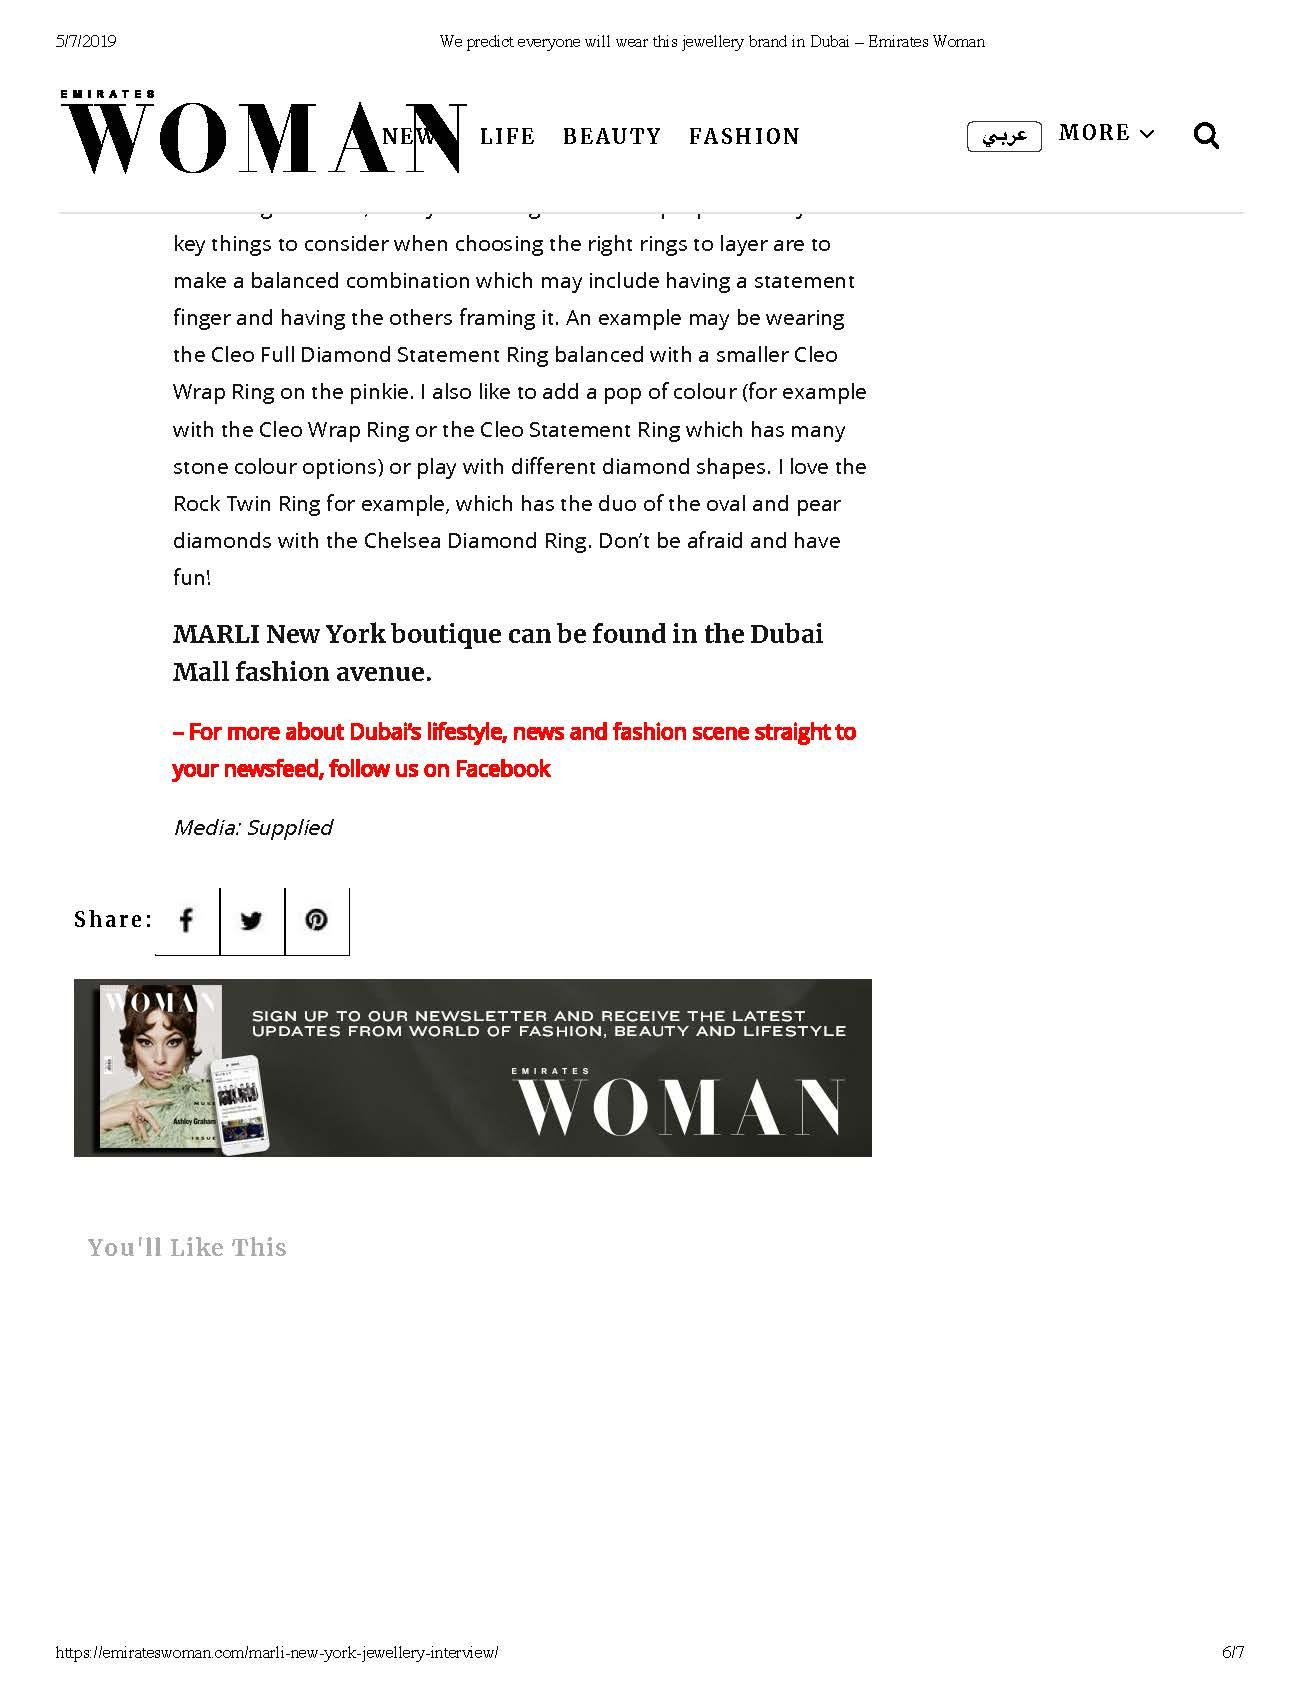 EmiratesWomen - Published Press Release - 5.7.19_Seite_6.jpg